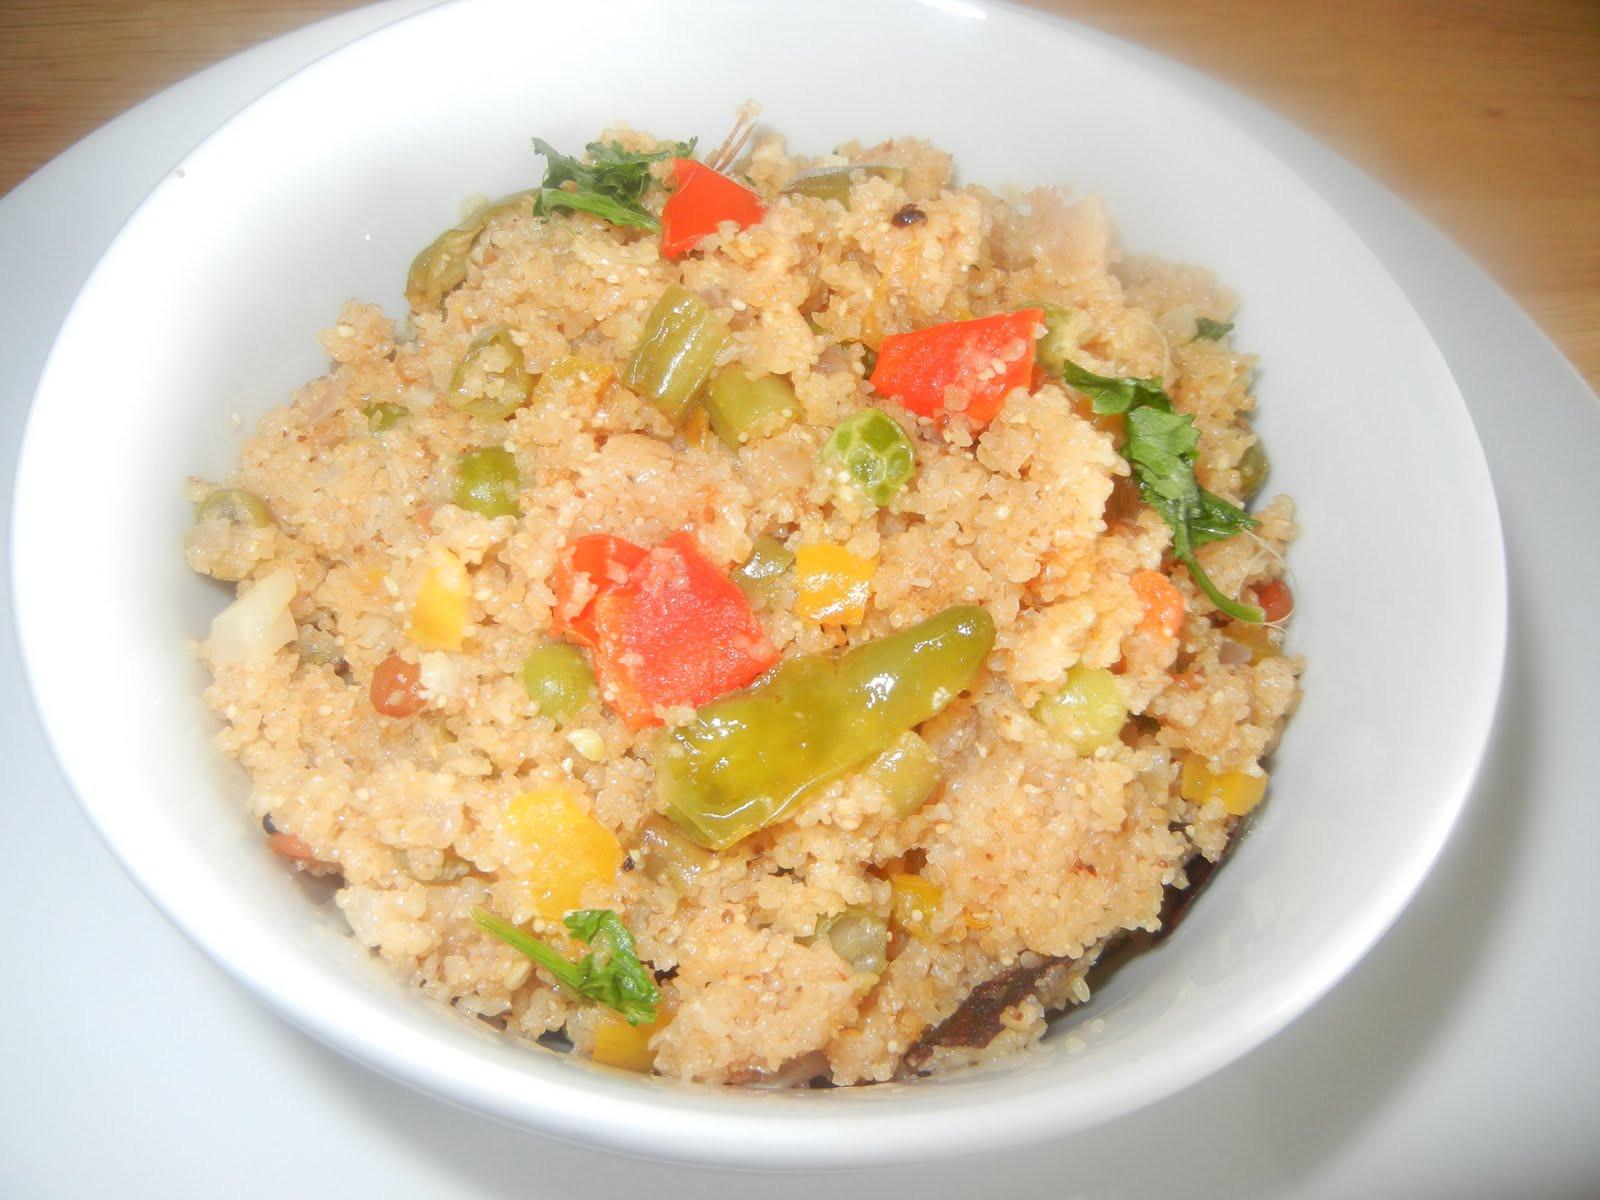 Healthy Breakfast Recipes Indian Vegetarian  Healthy Breakfast Recipes Indian Ve arian